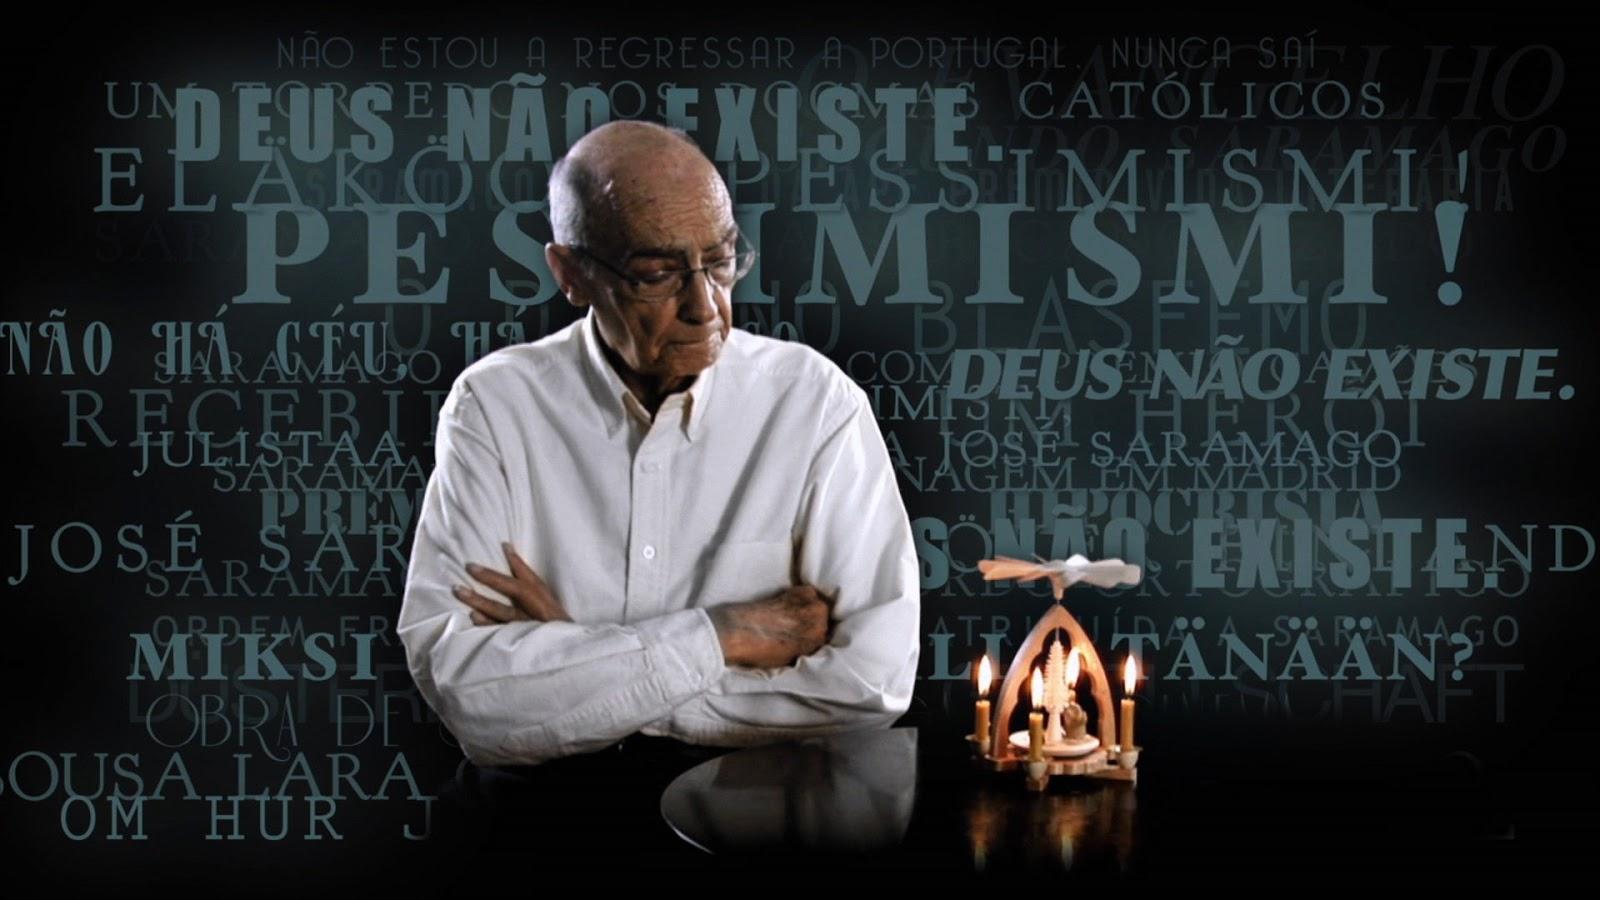 Reto - José Saramago